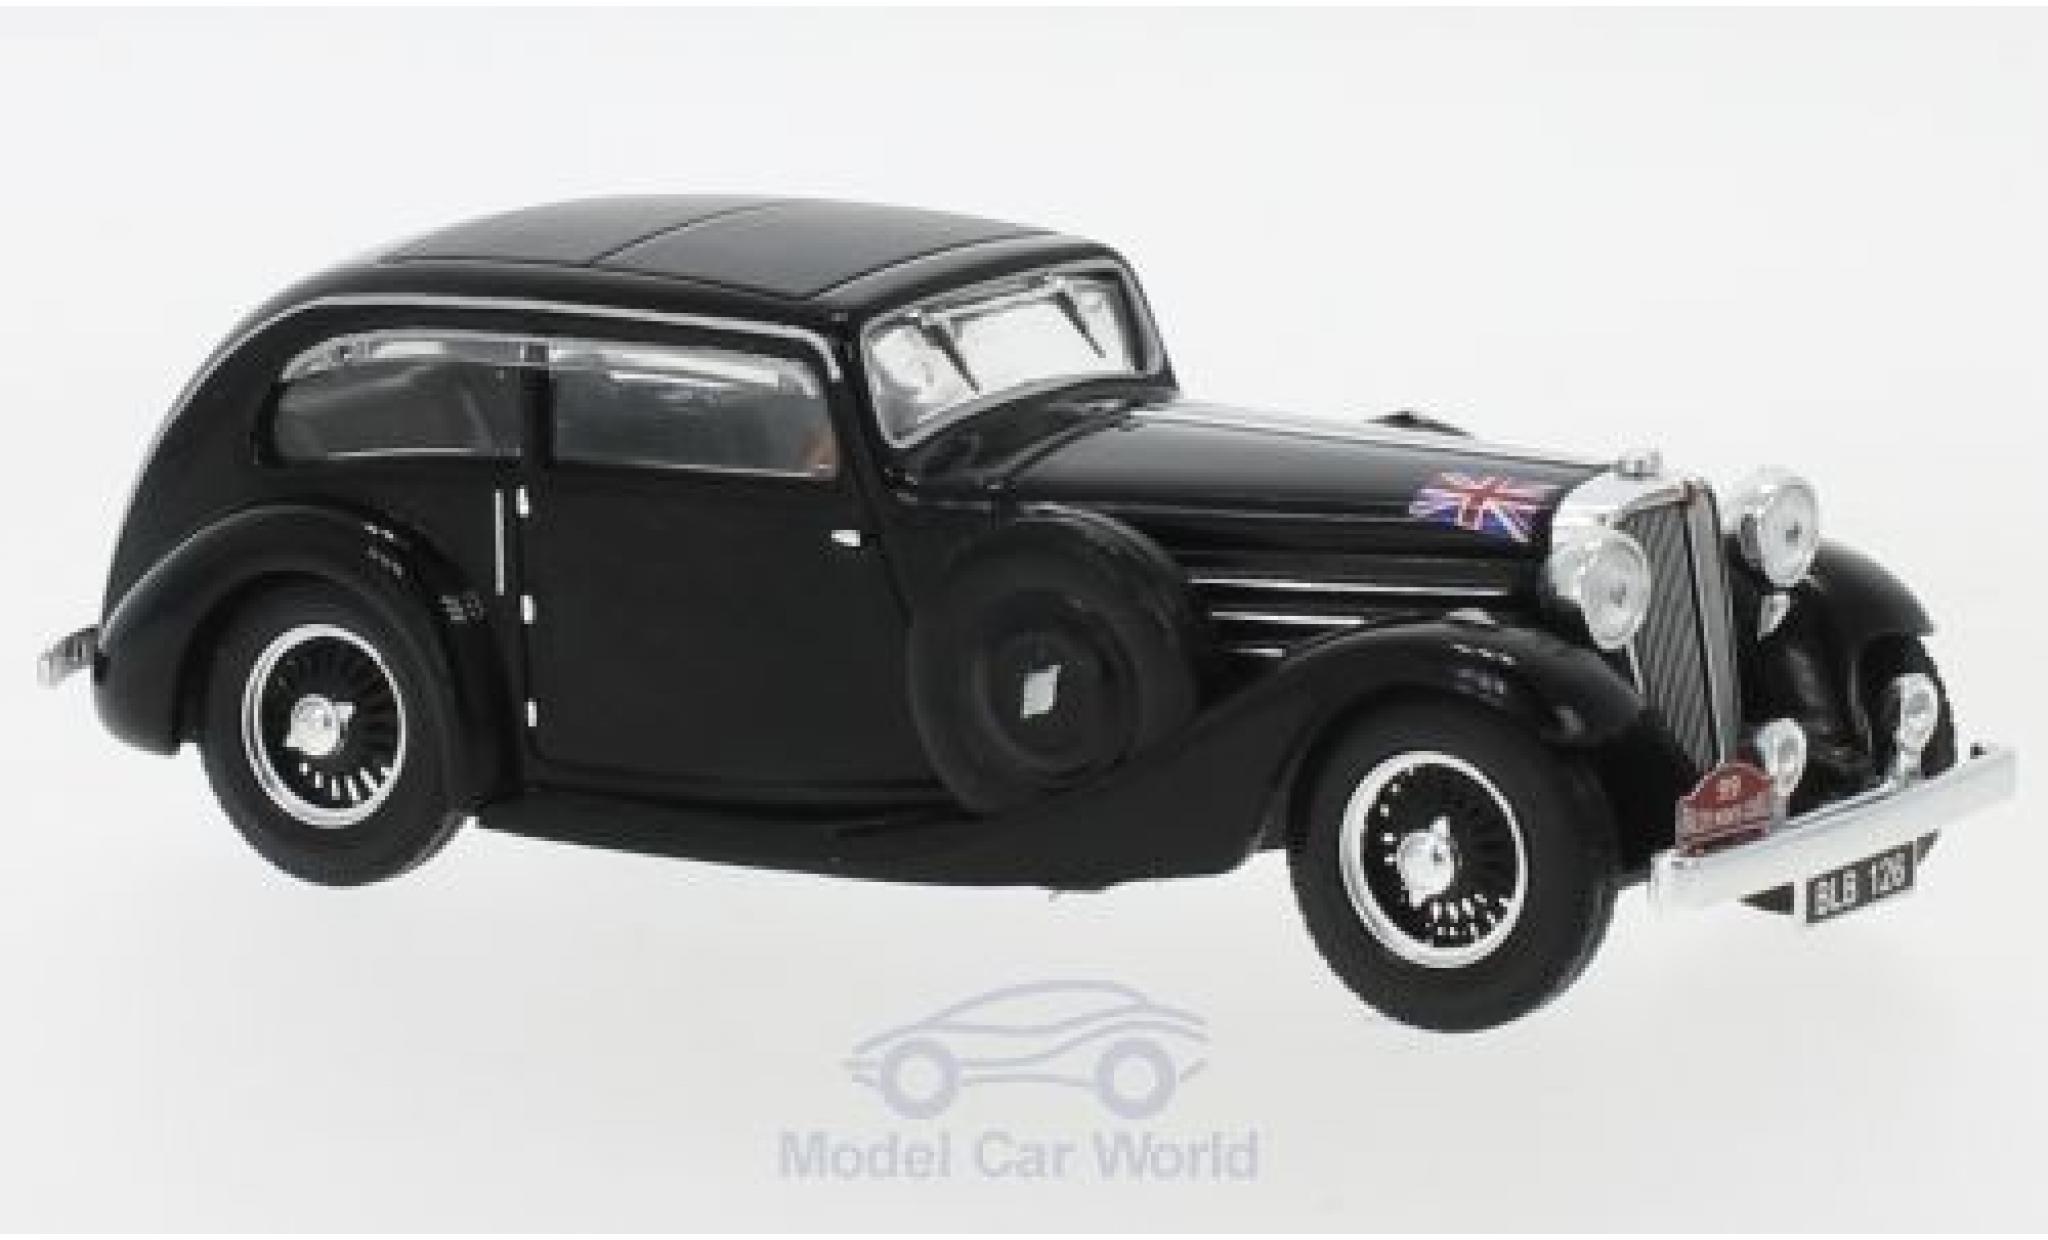 Jaguar SS 1/43 IXO 1 Airline Coupe RHD No.99 Rallye Monte Carlo 1935 Sydney H. Light